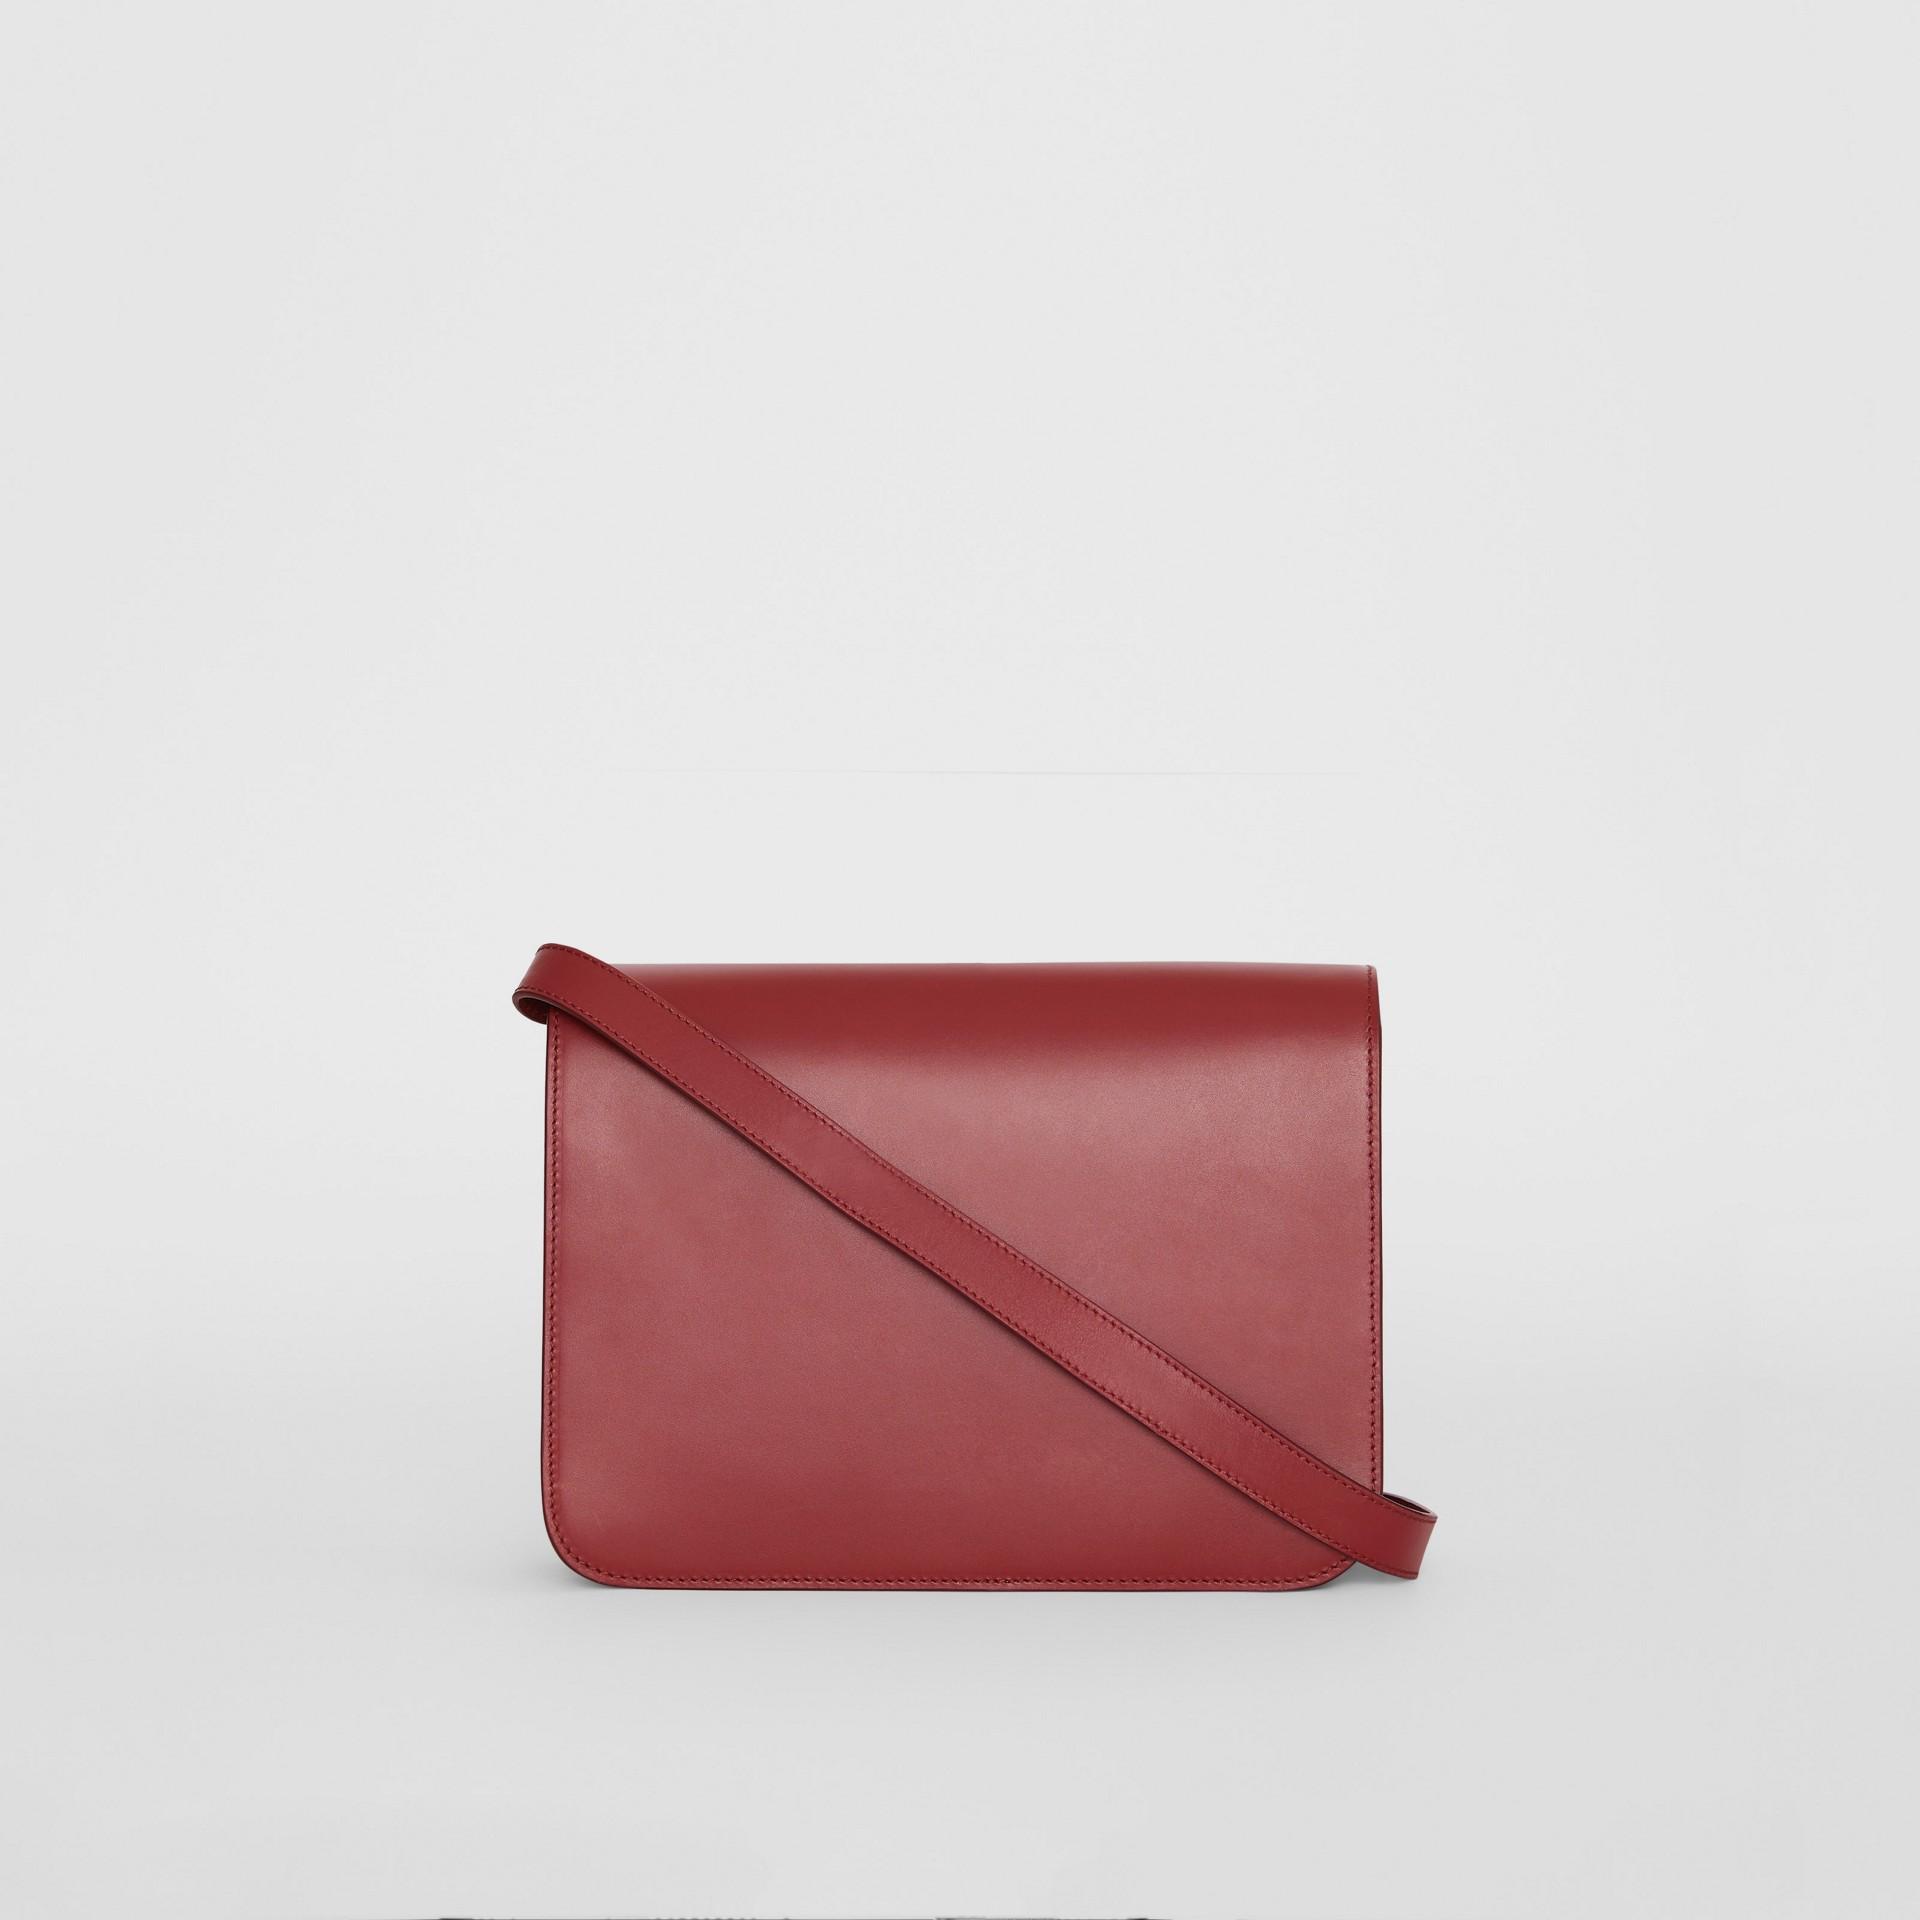 Medium Leather TB Bag in Crimson - Women   Burberry United States - gallery image 7